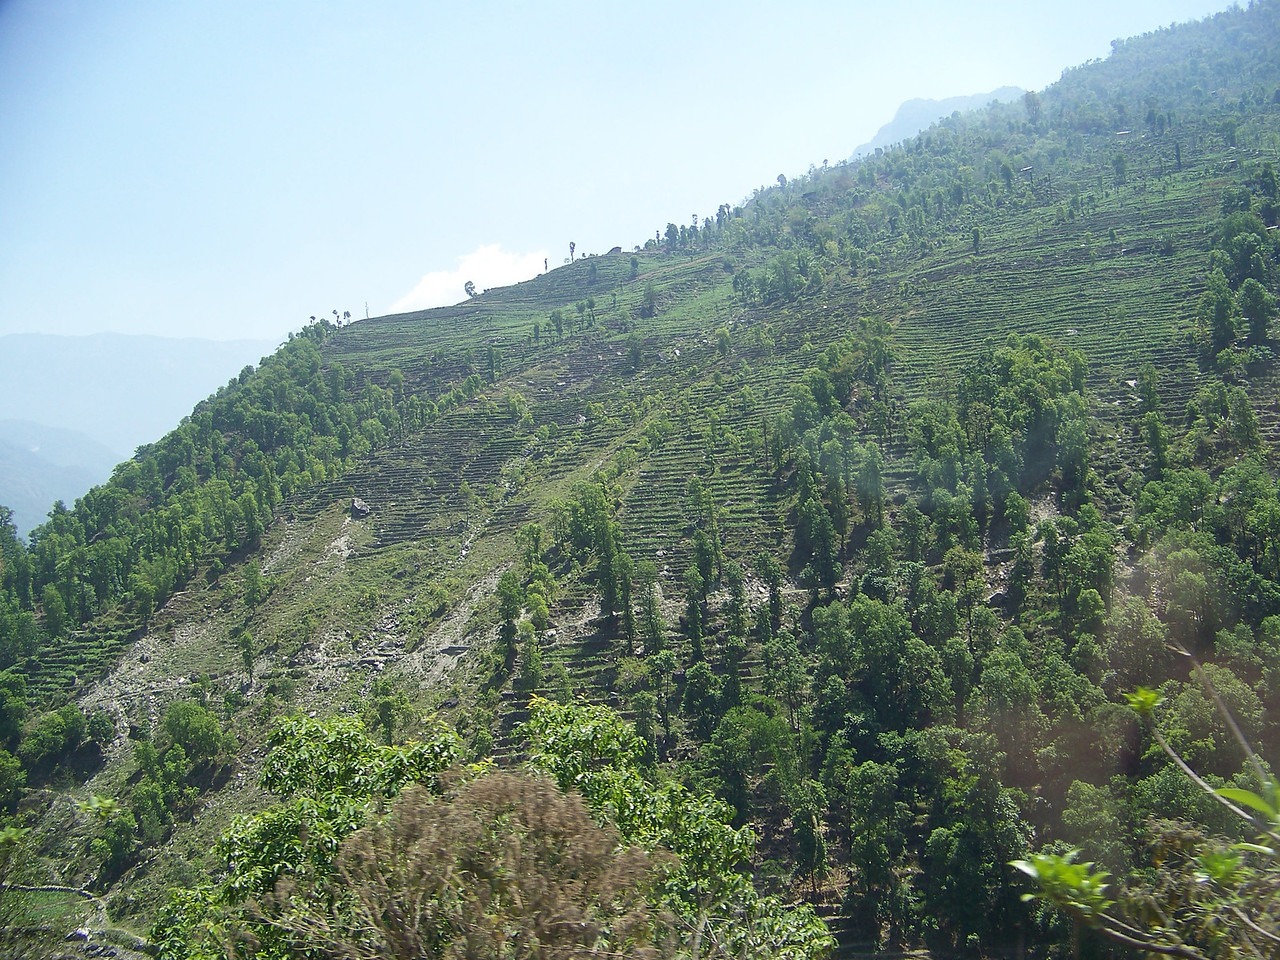 0652 - Scenery along Araniko Highway in Nepal Between Kodari and Katmandu - Nepal.JPG